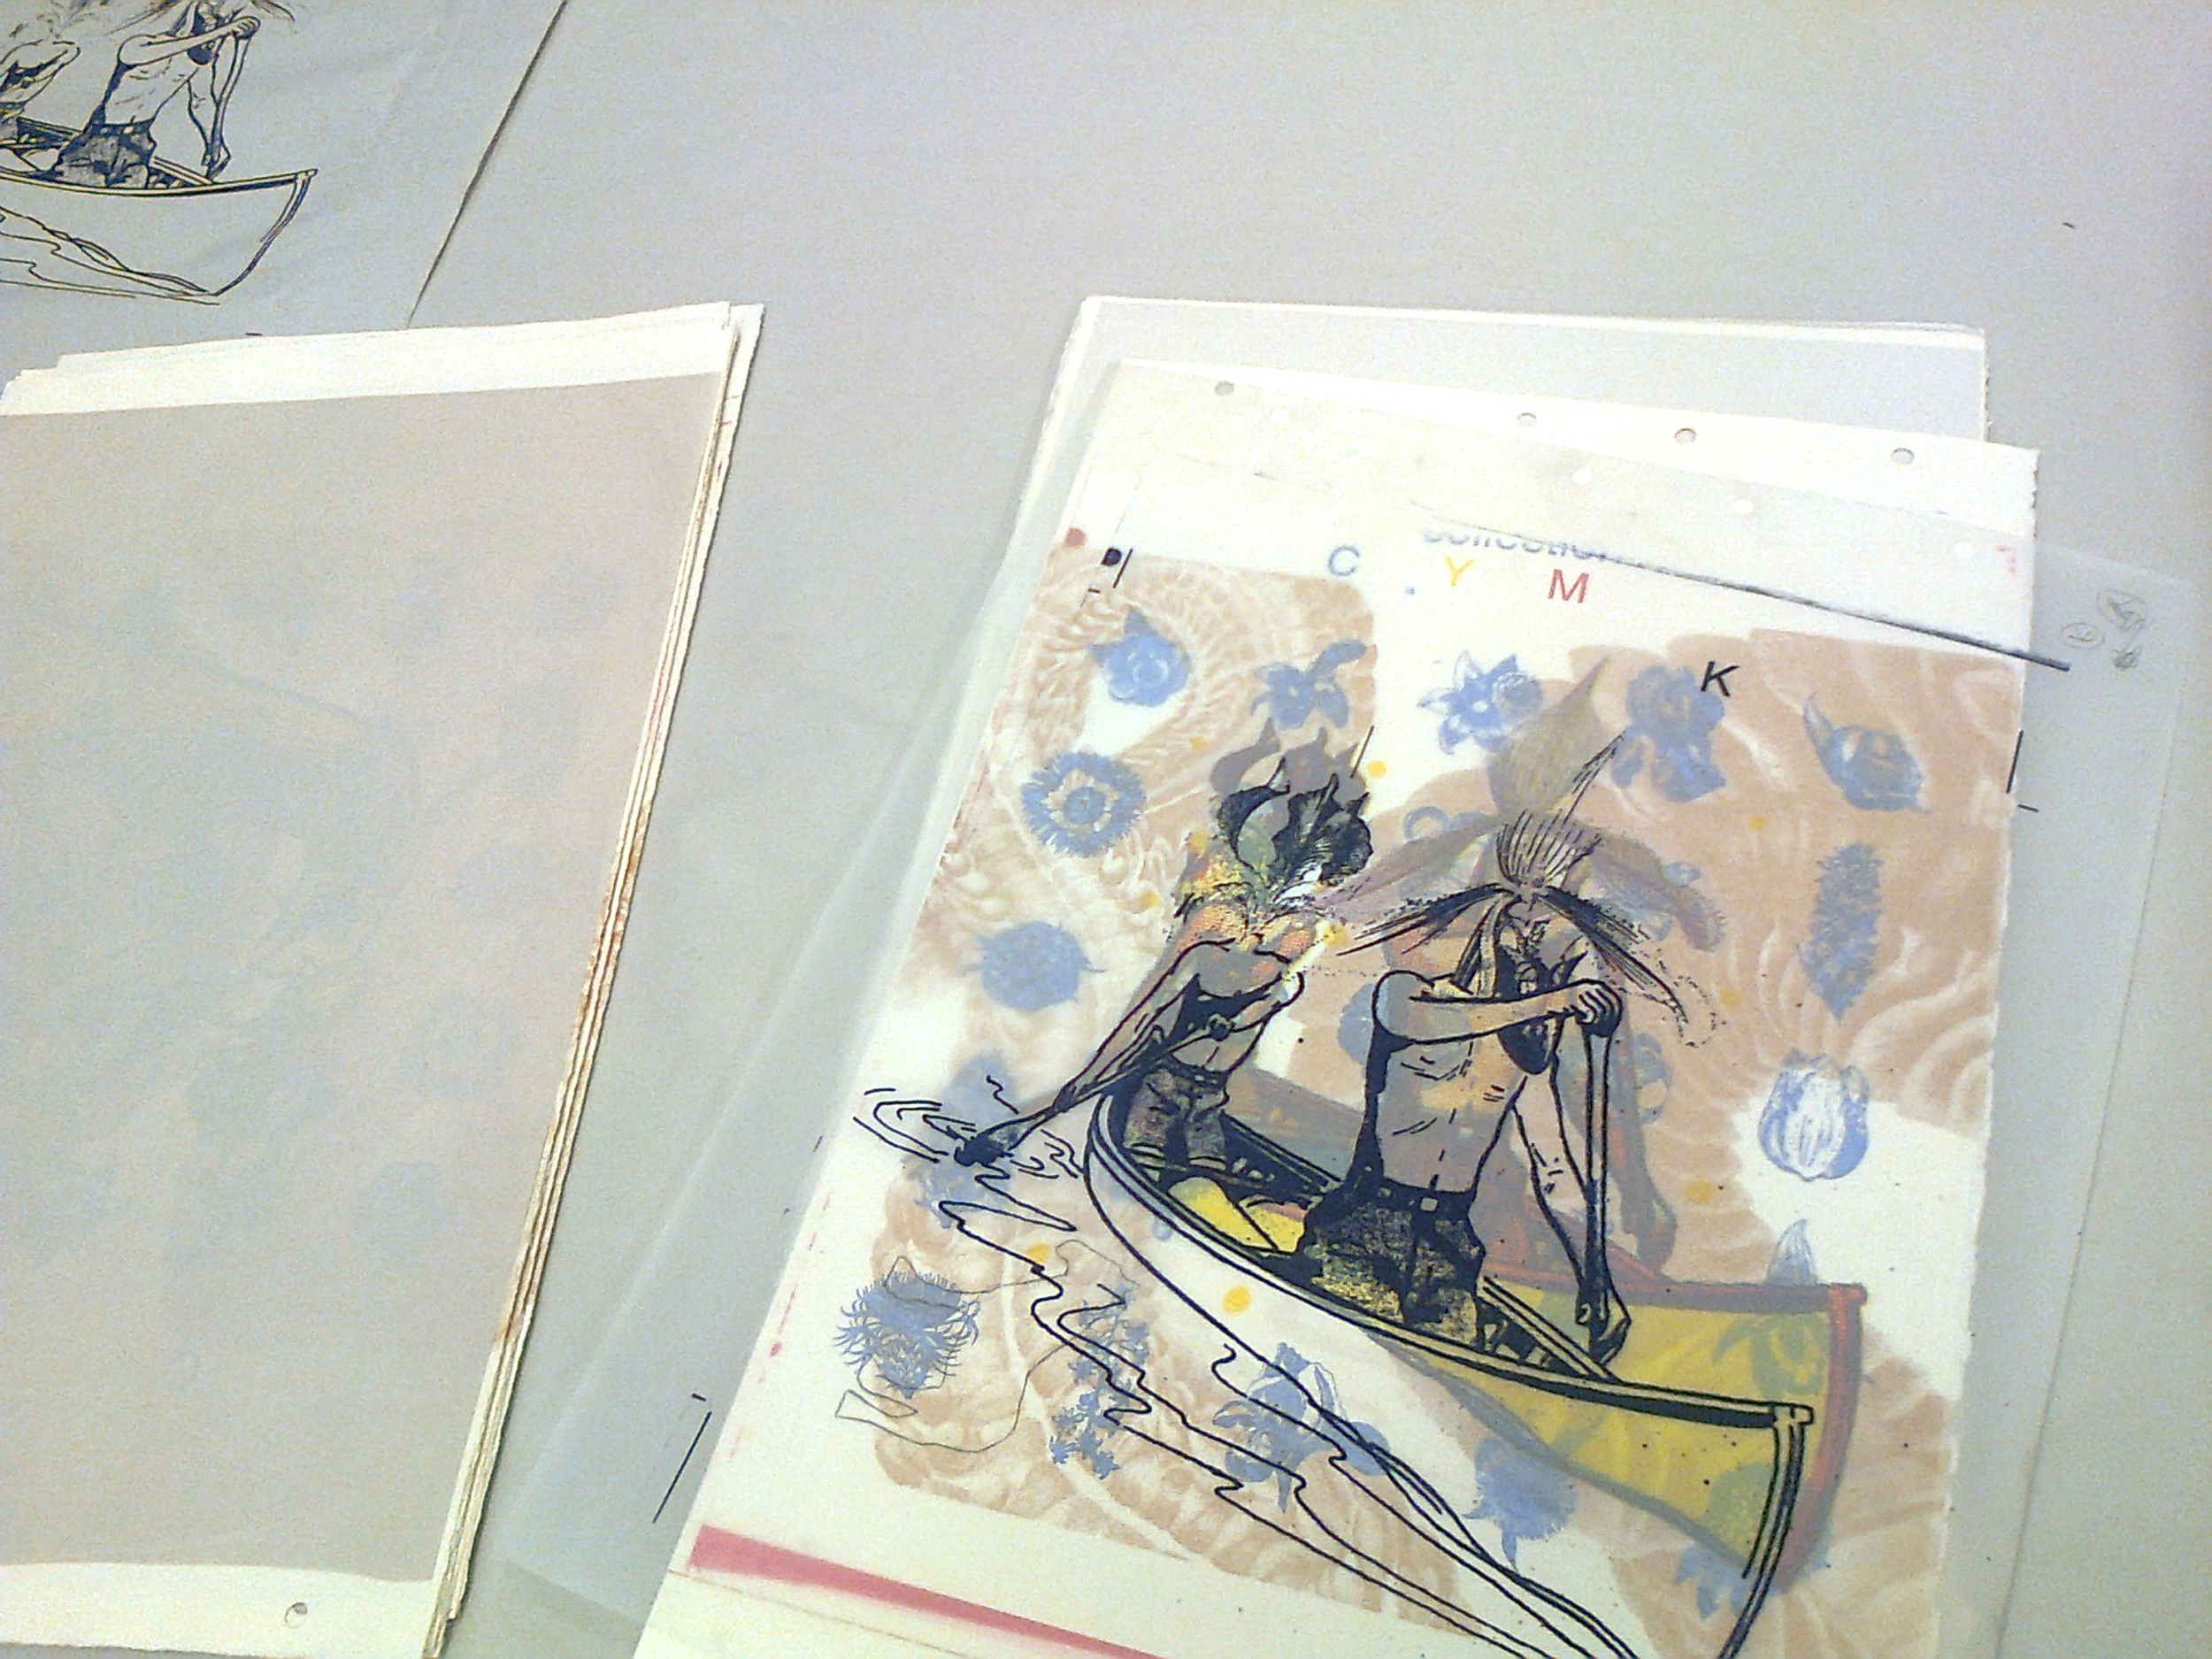 testimonial-i-iii-iii-progress-documentation-cellphone-sketchbook-069.jpg